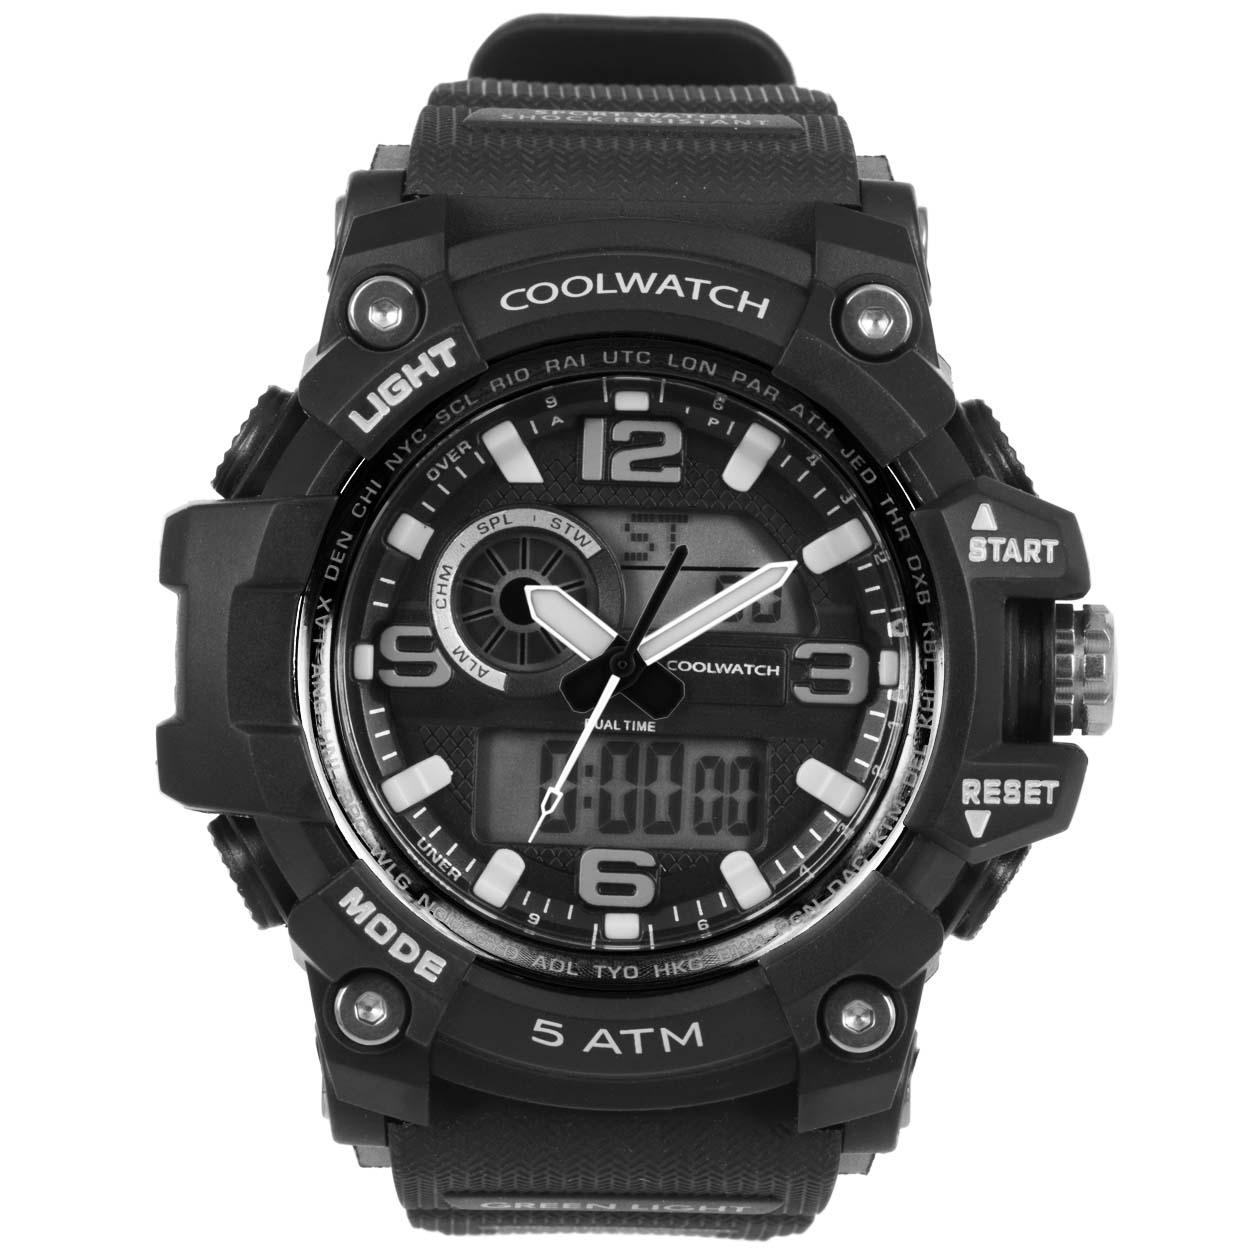 Coolwatch Herenhorloge CW.388 Plastic/silicone Kunststof